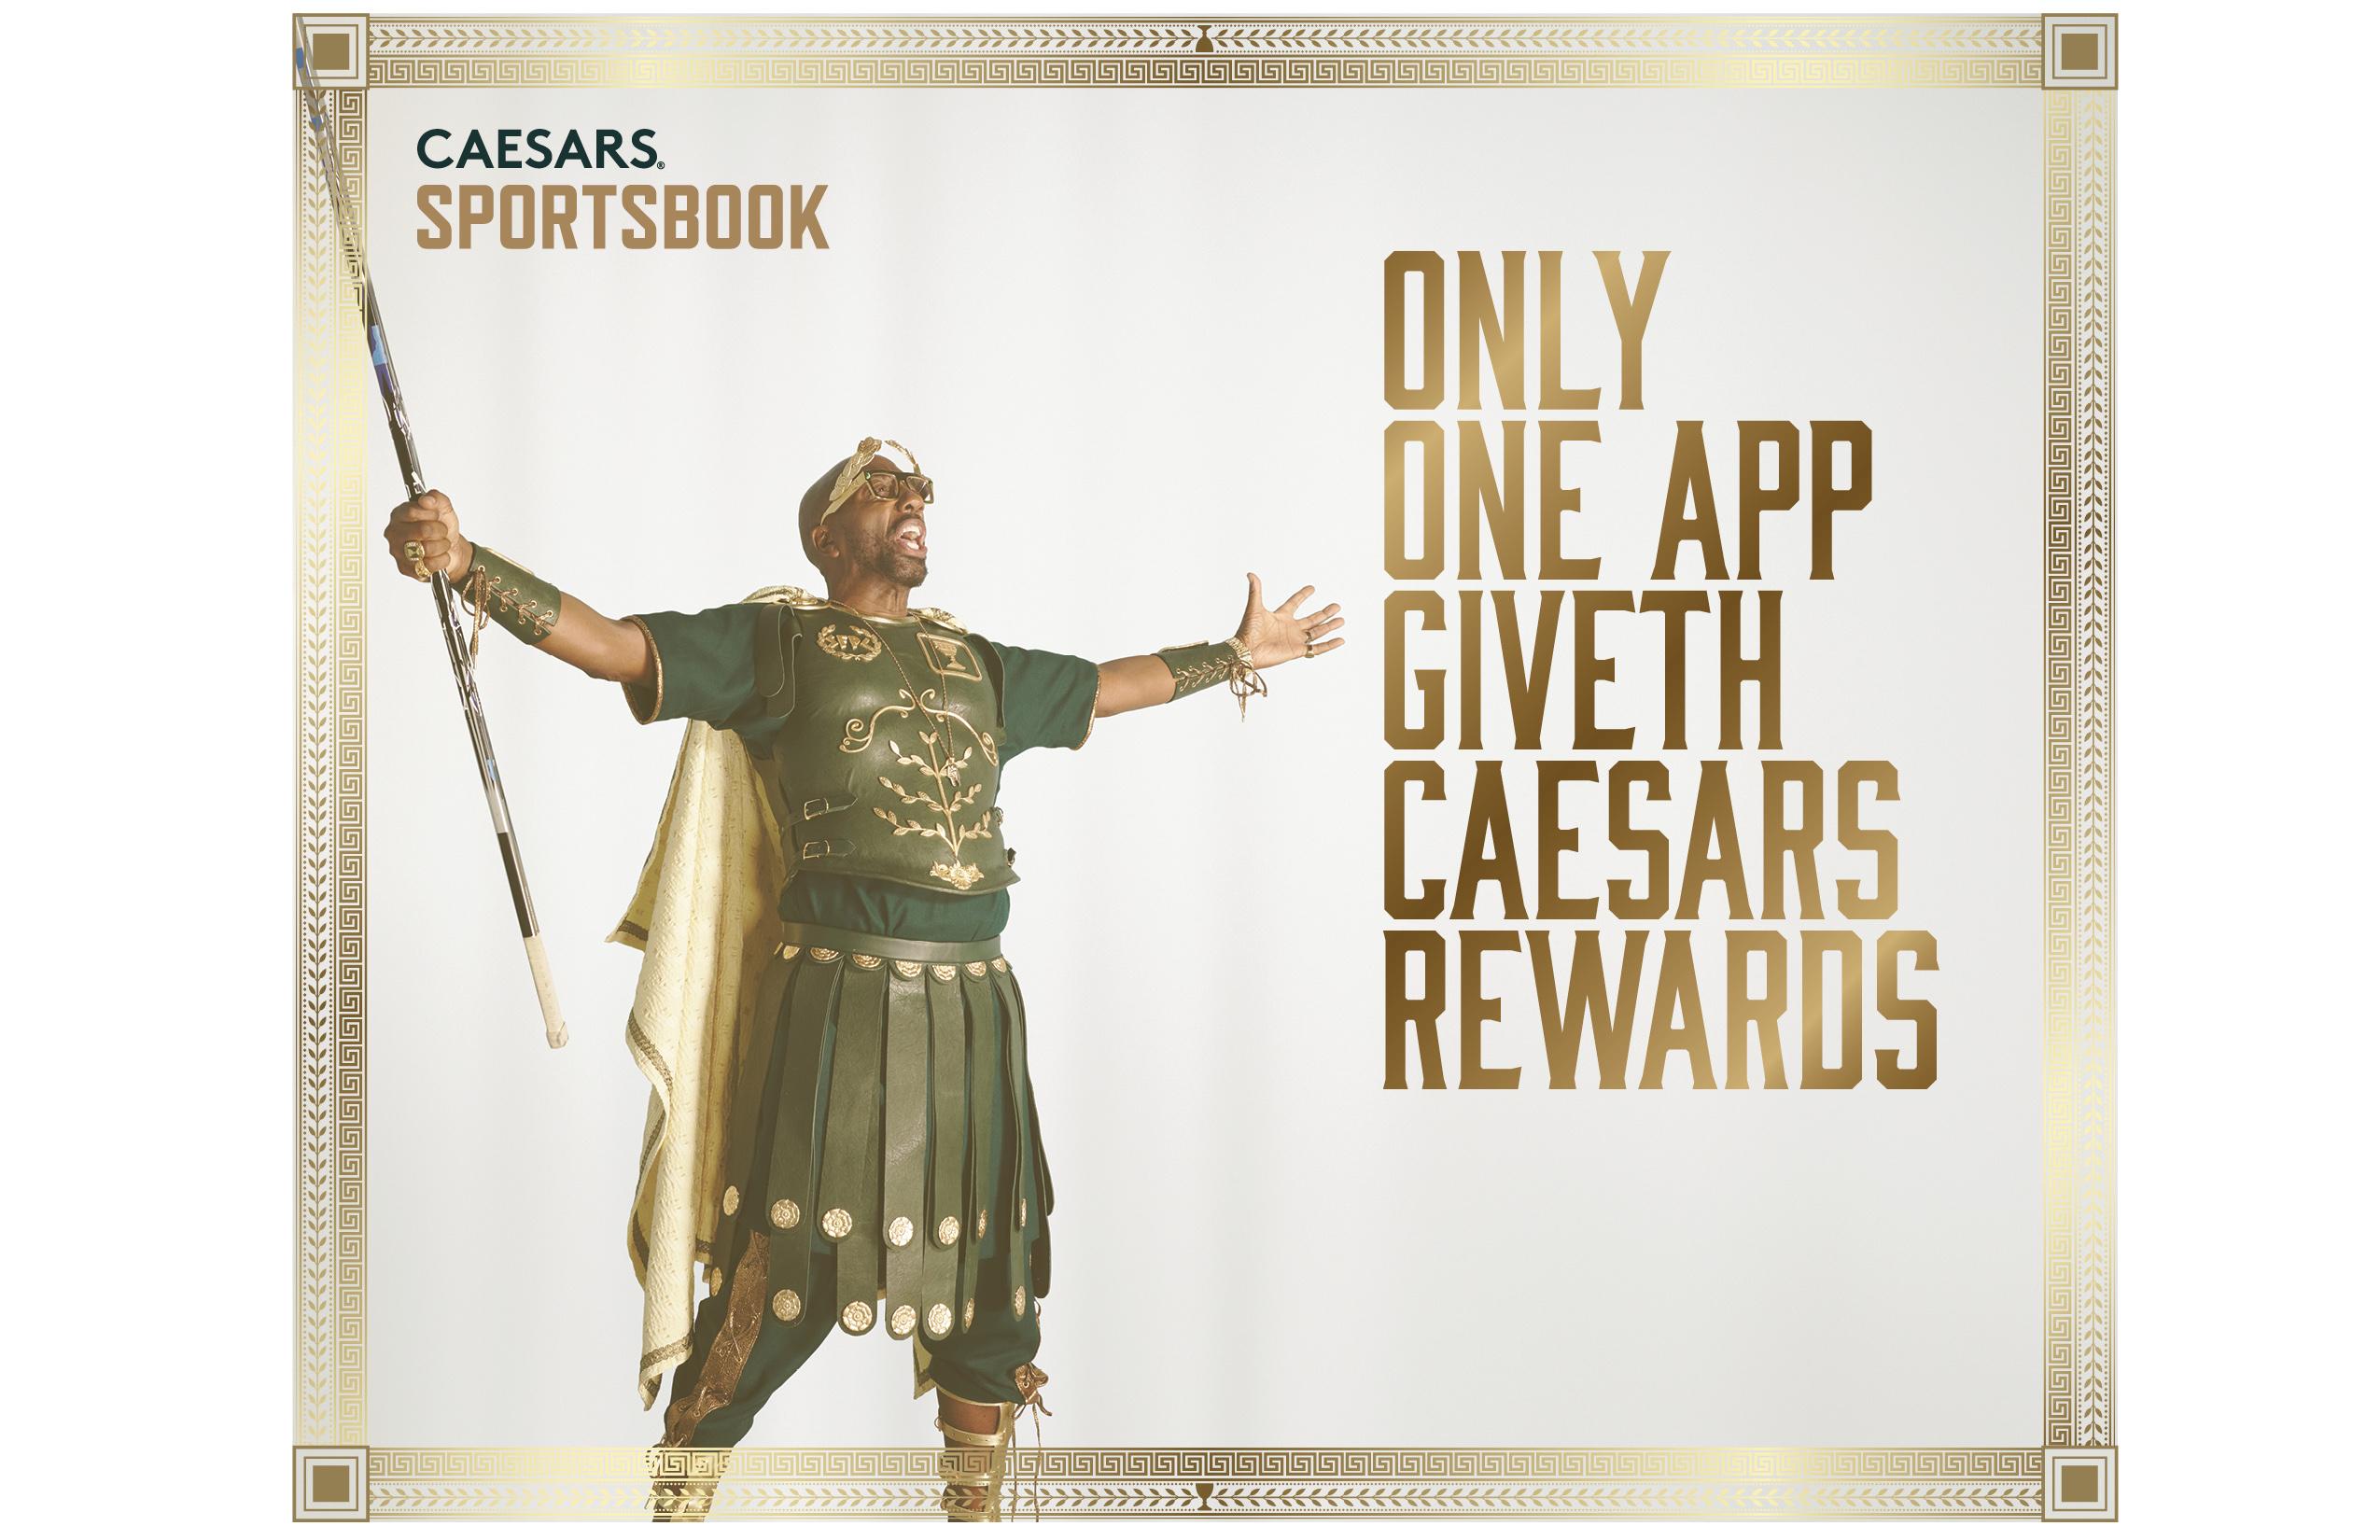 Caesars Sportsbook app earns players VIP experiences through Caesars Rewards.